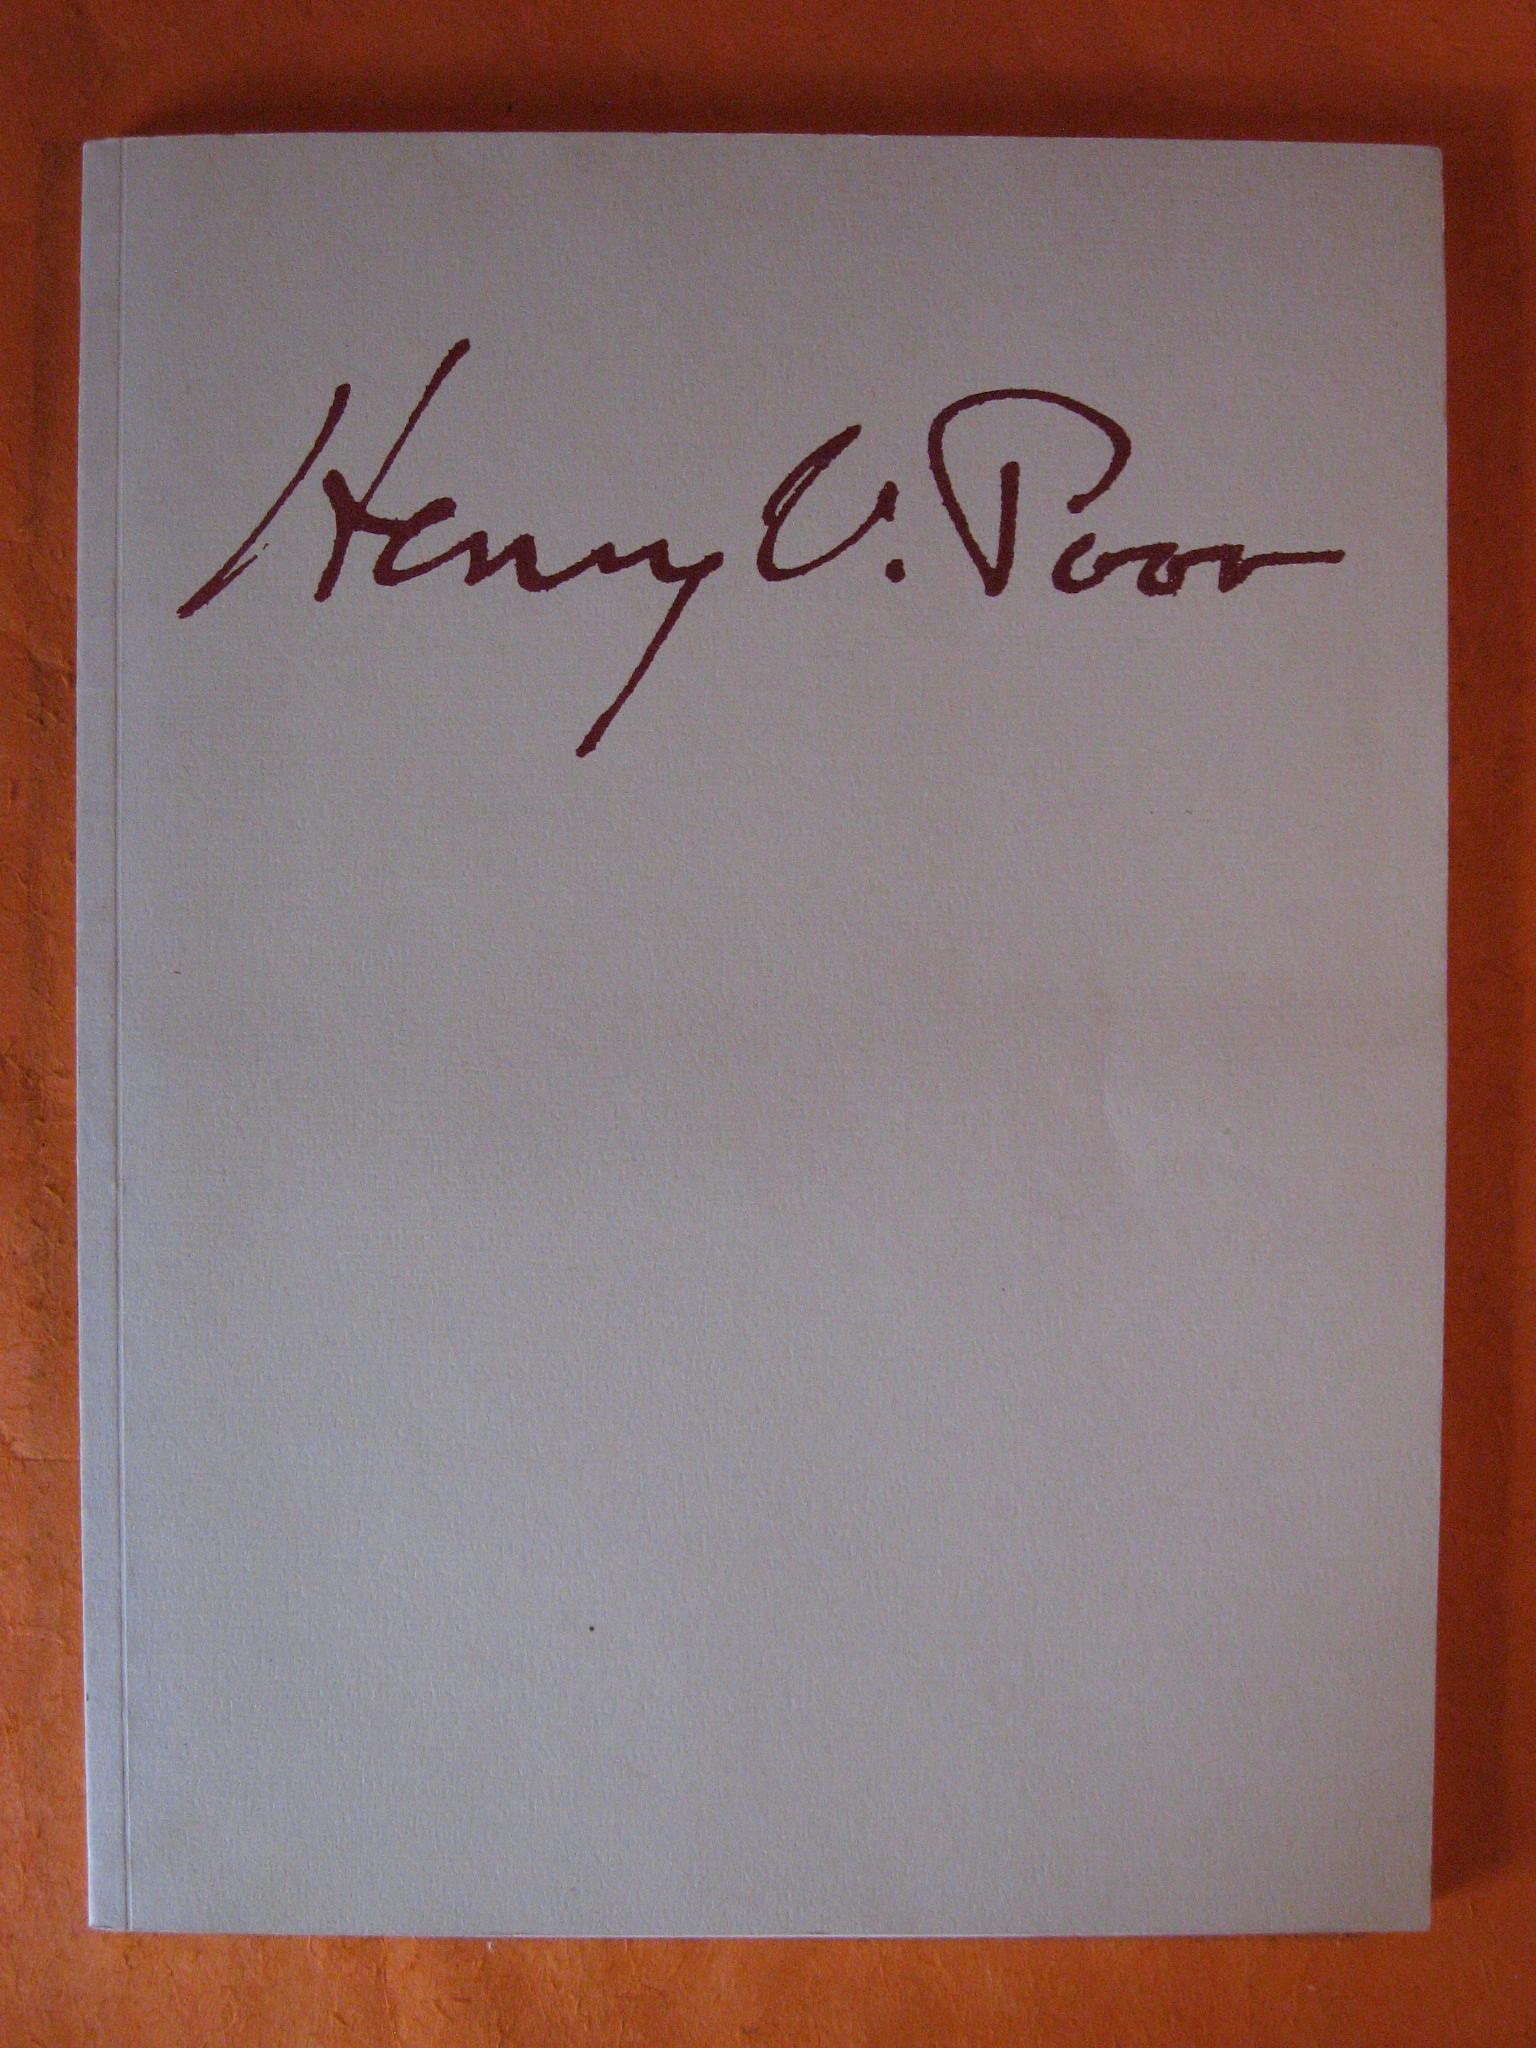 Henry Varnum Poor, 1887 -- 1970, a Retrospective Exhibition, Henry Varnum Poor